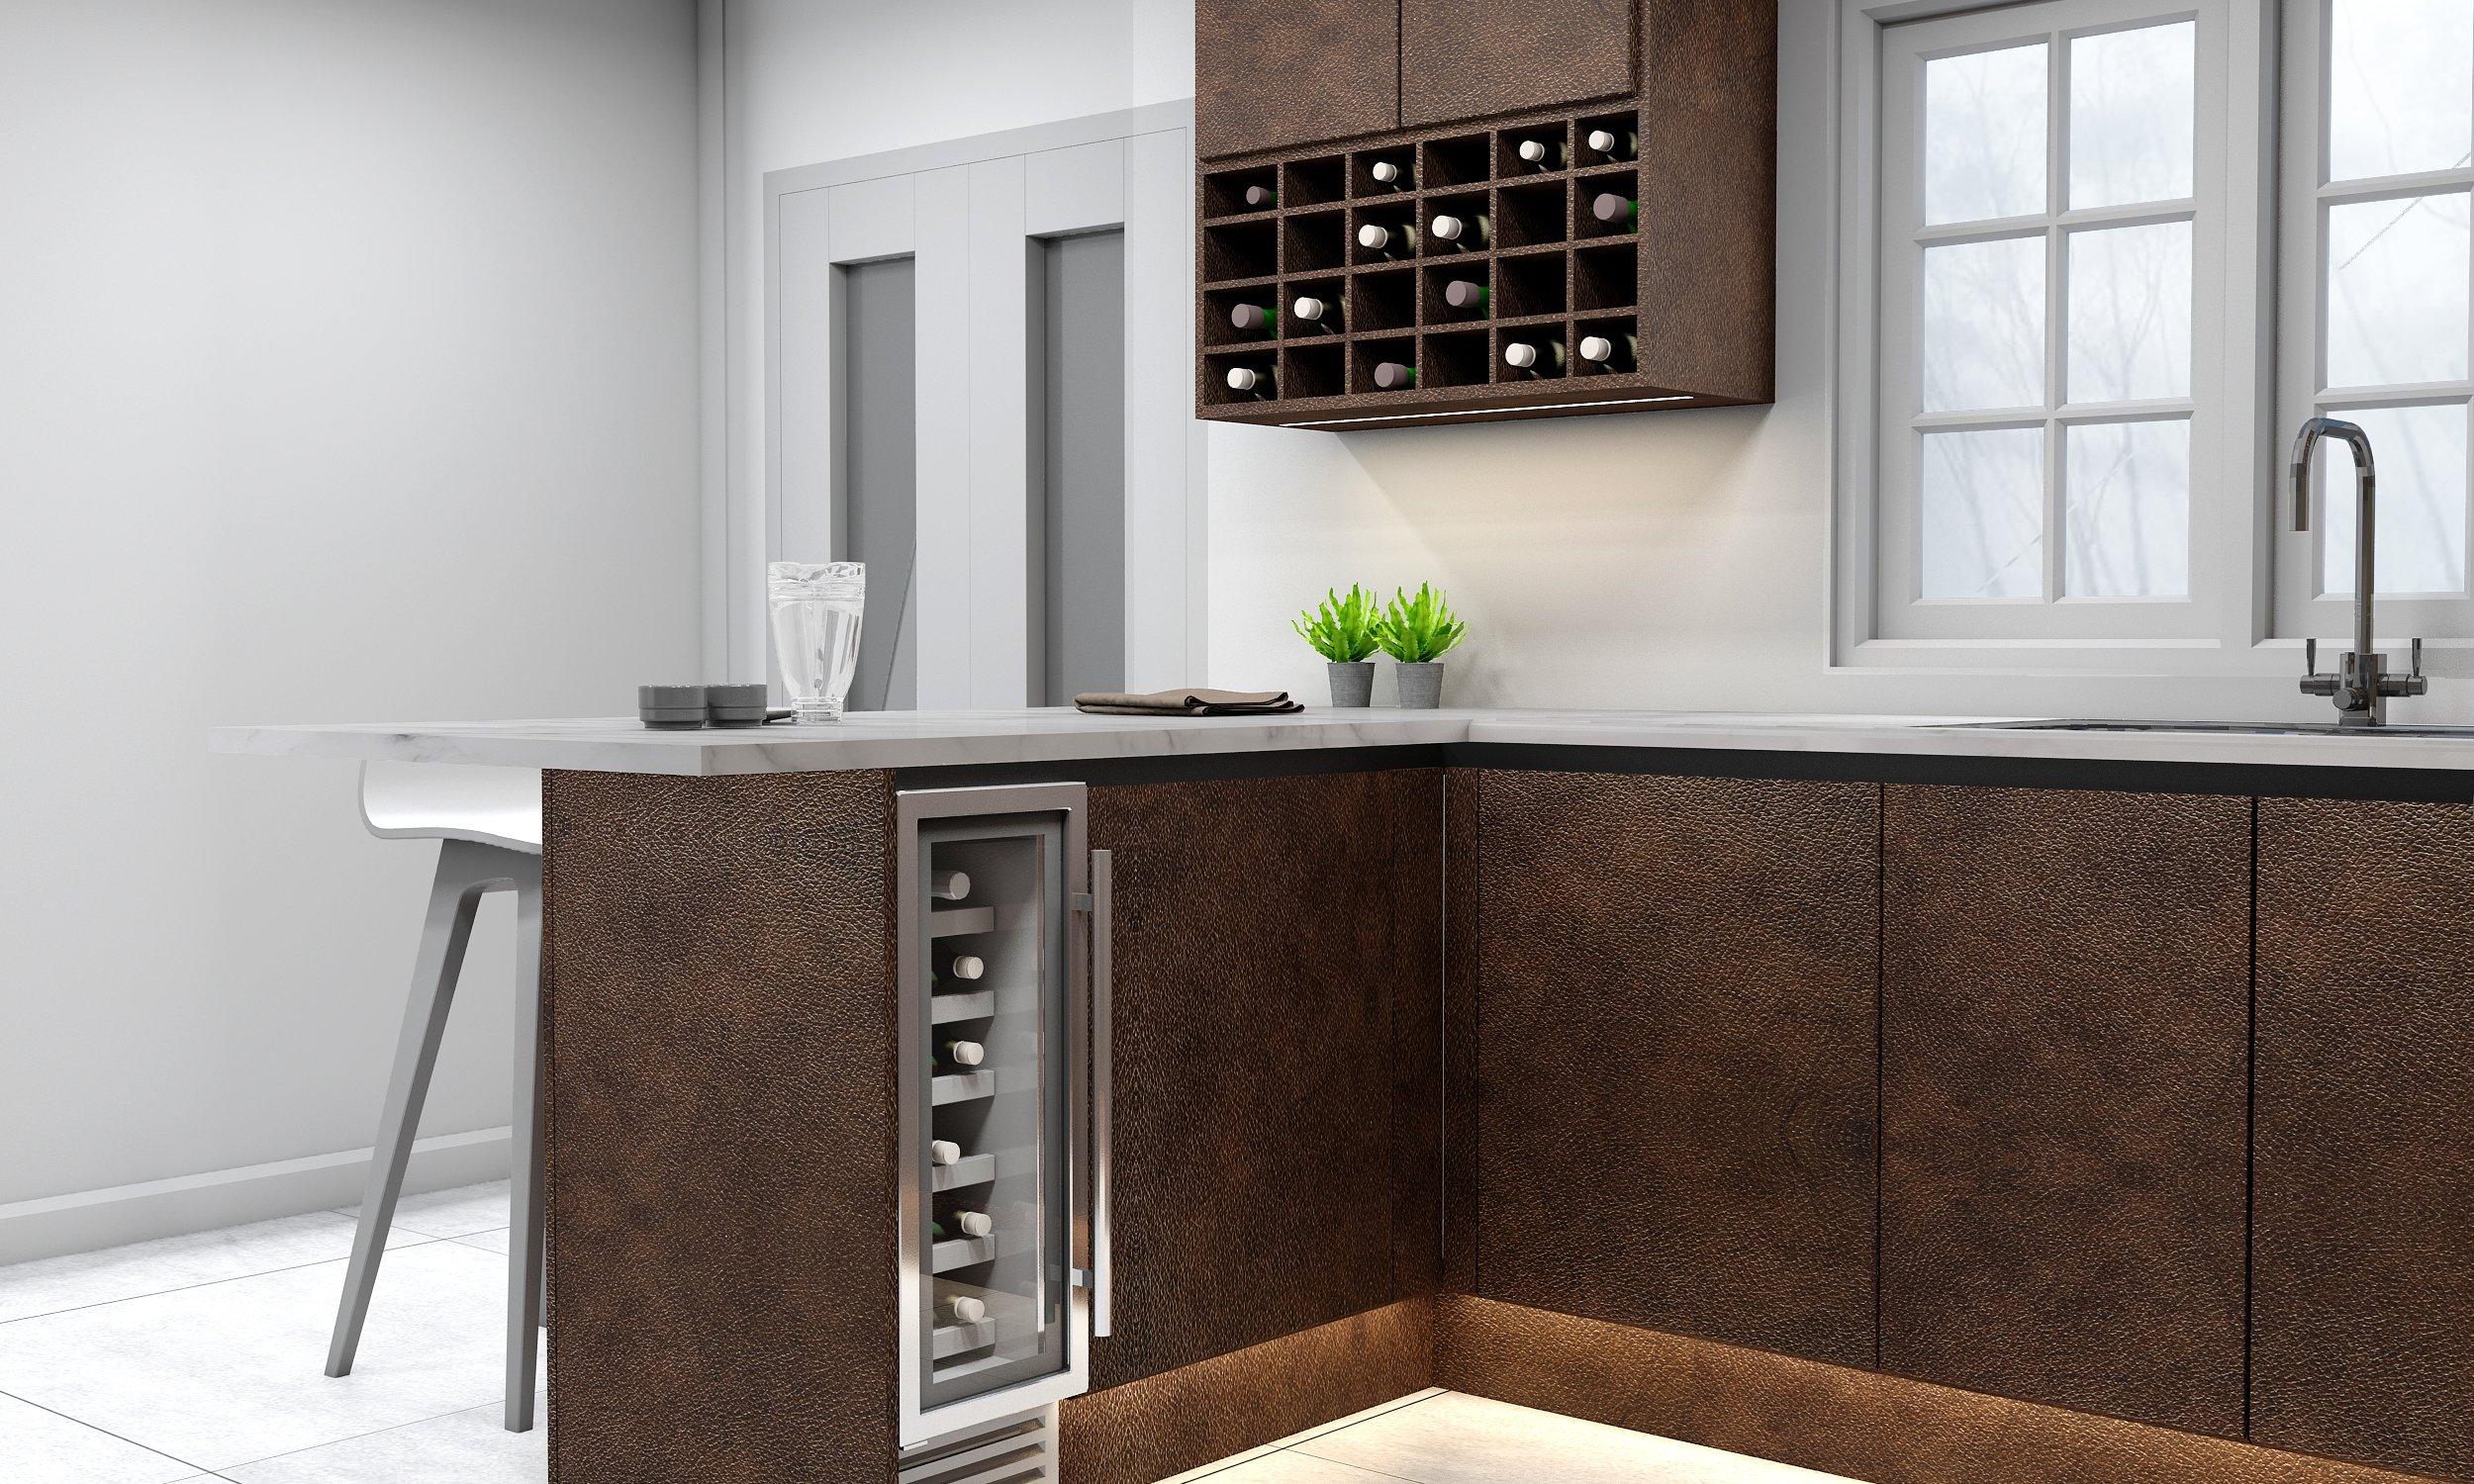 Premiumline kitchen with Bronze finish with black handle profile.